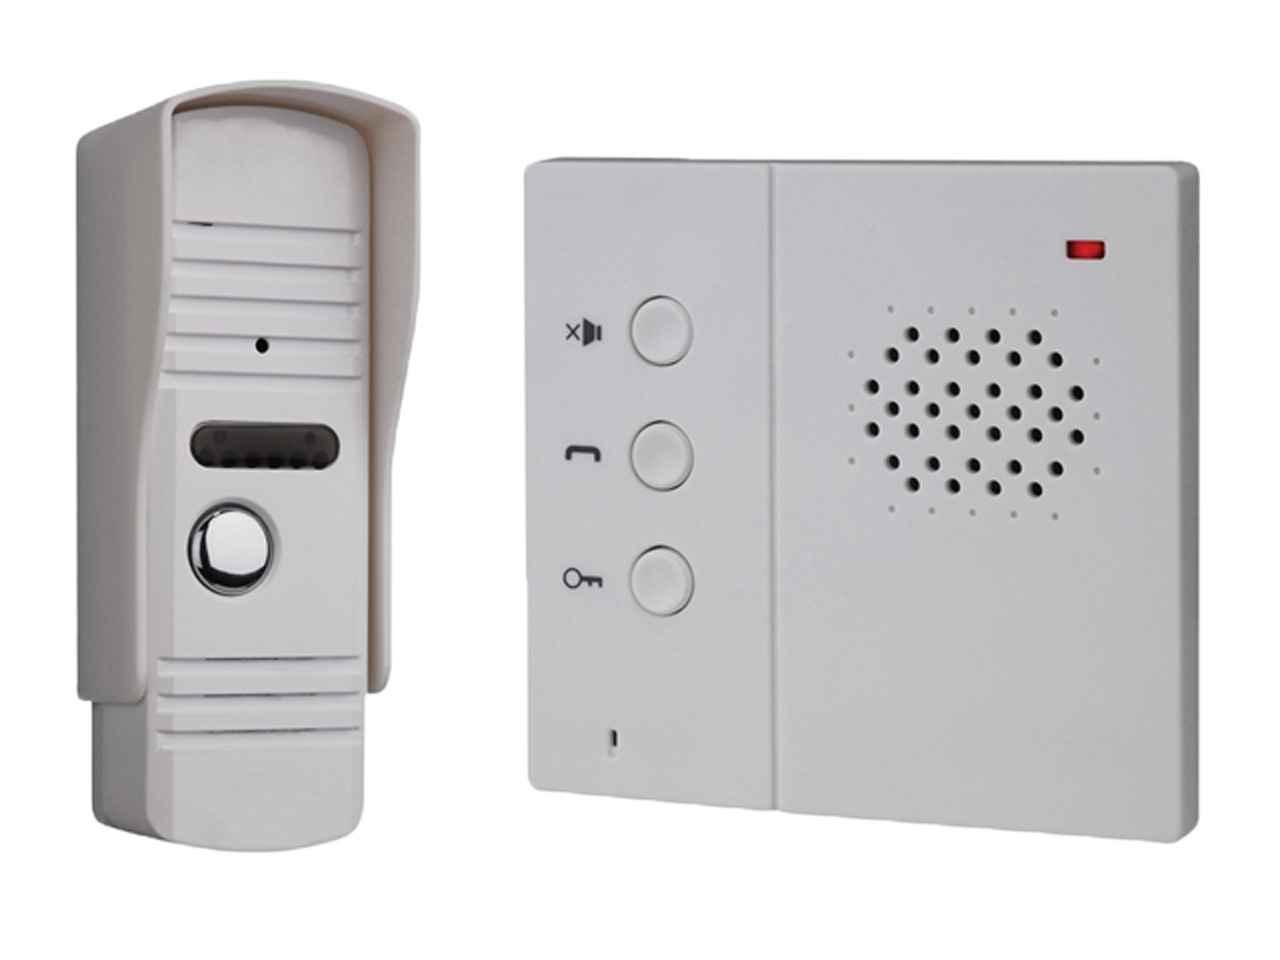 sc 1 st  FFX & Byron IB71 Hands-Free Wired Audio Door Intercom